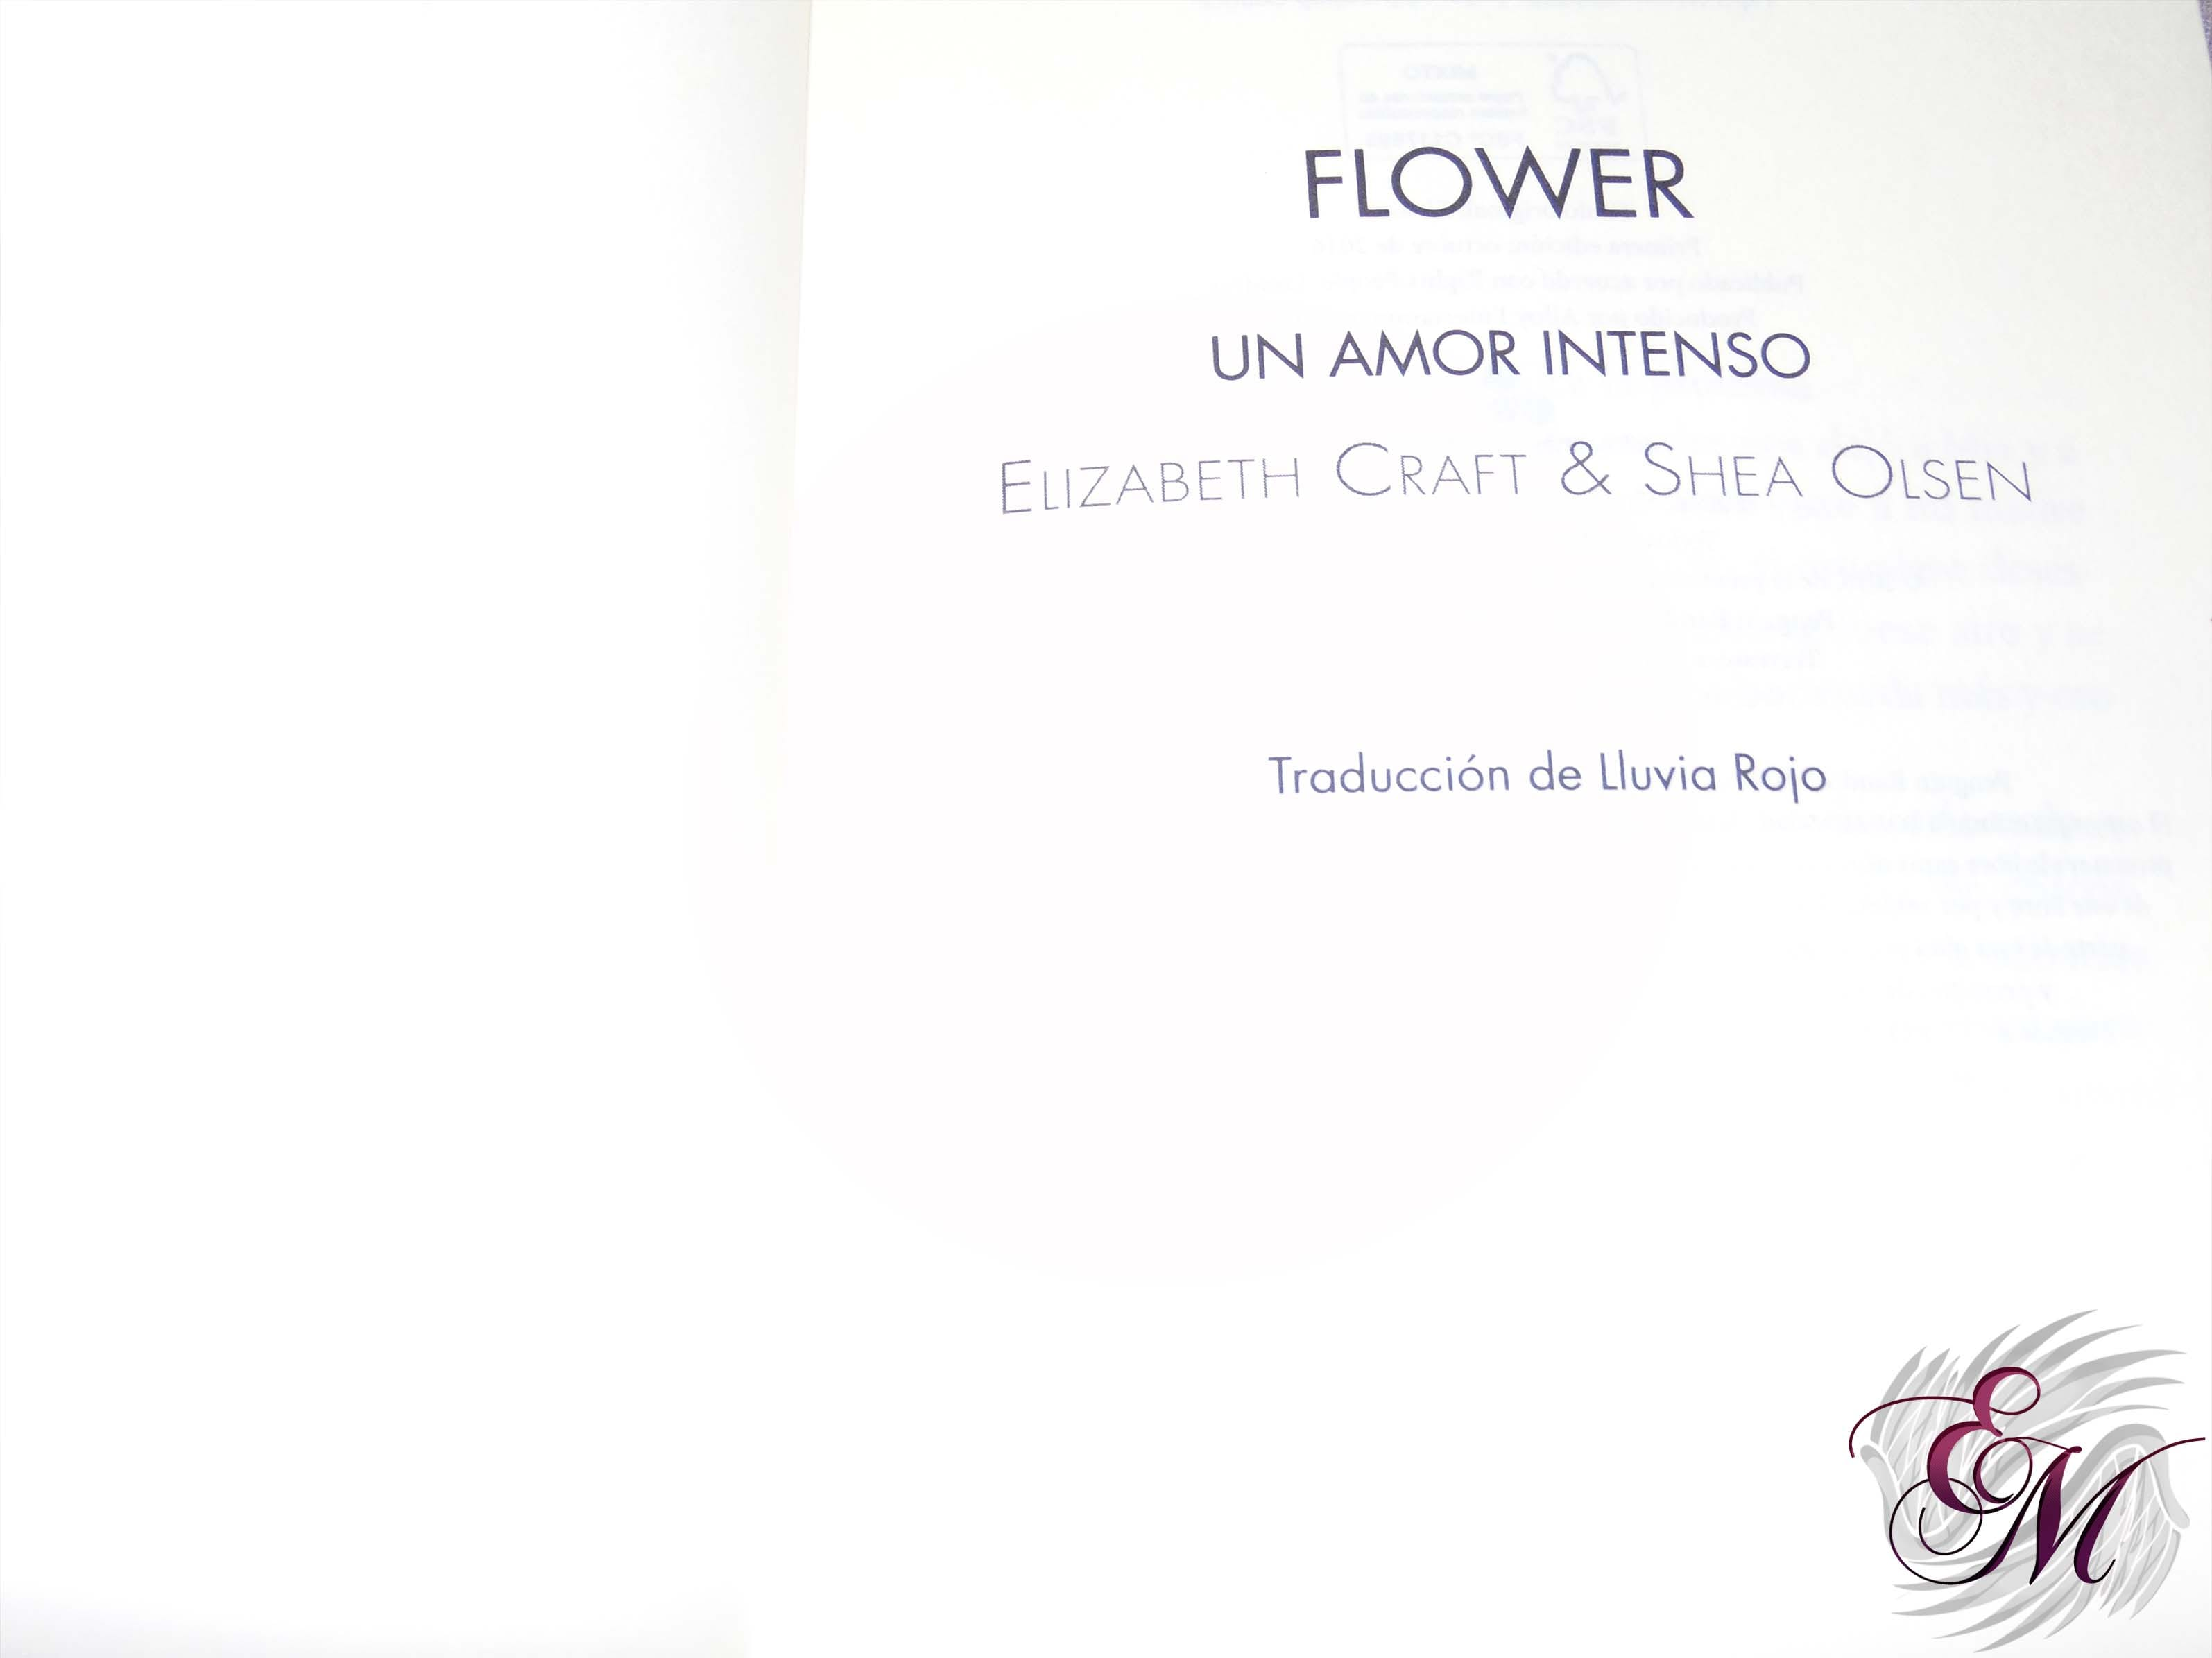 Flower un amor intenso, de Elisabeth Craft y Shea Olsen